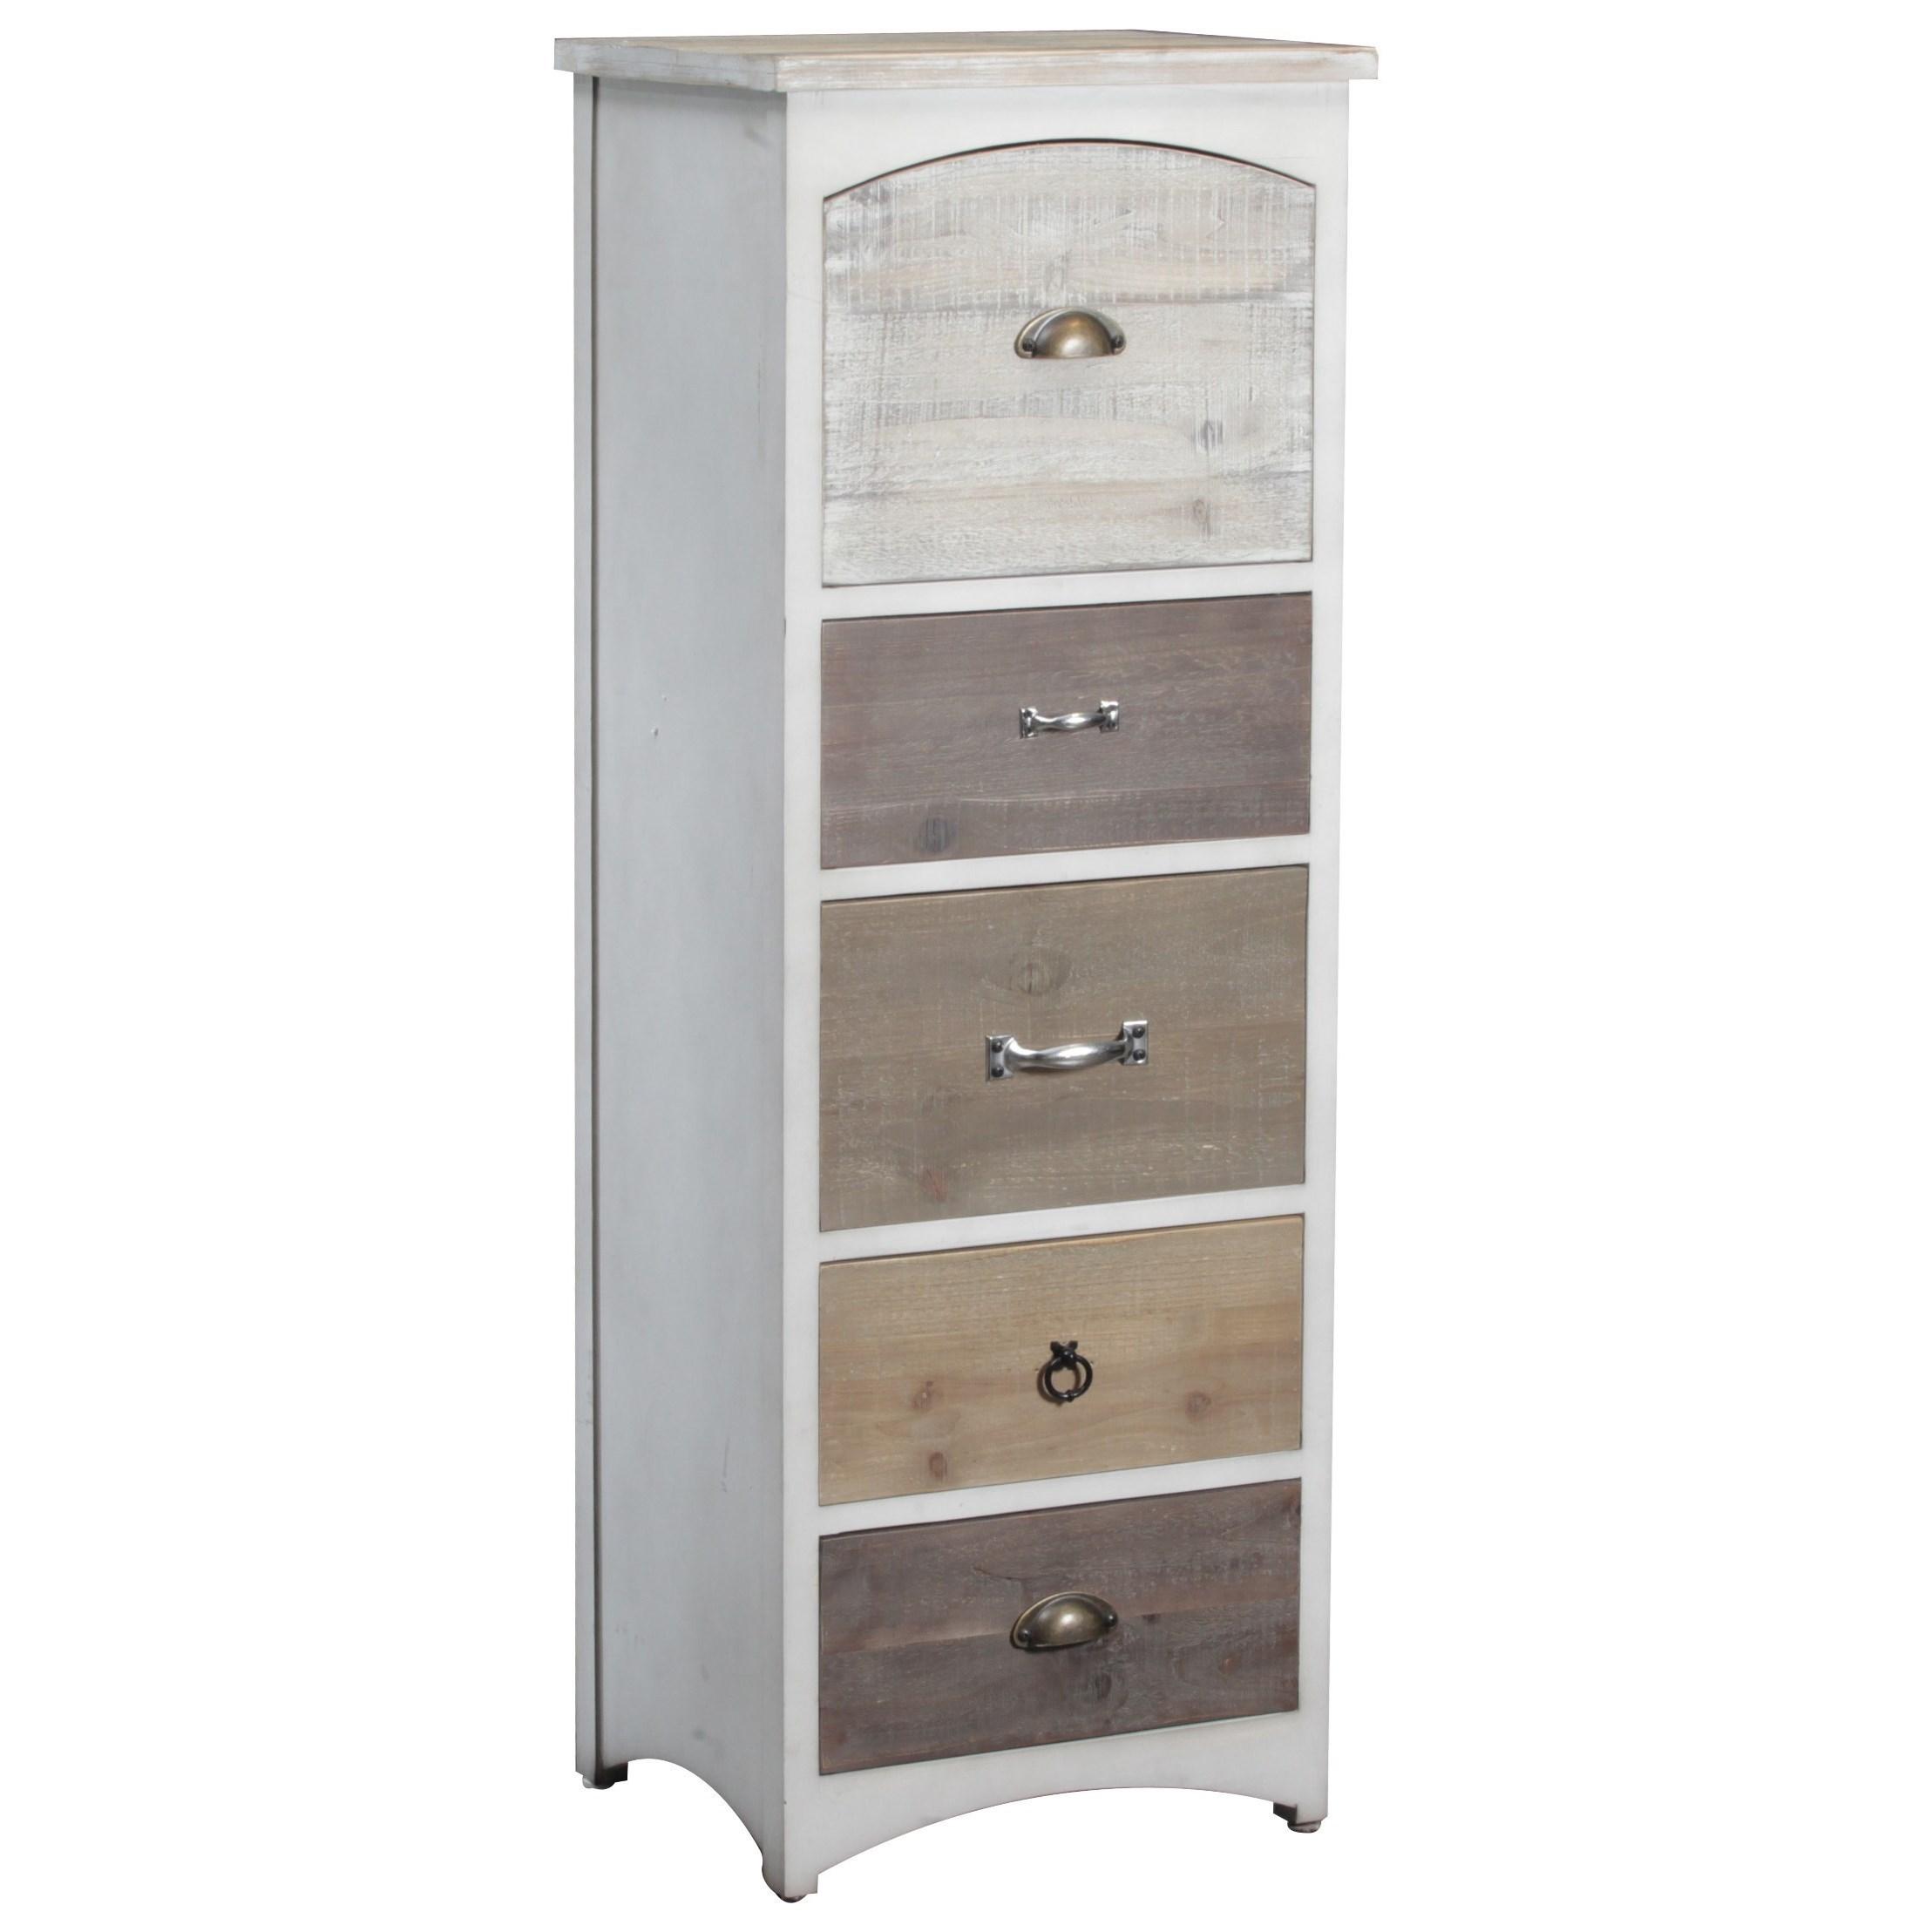 Brighton Brighton Tall Cabinet by Powell at Bullard Furniture